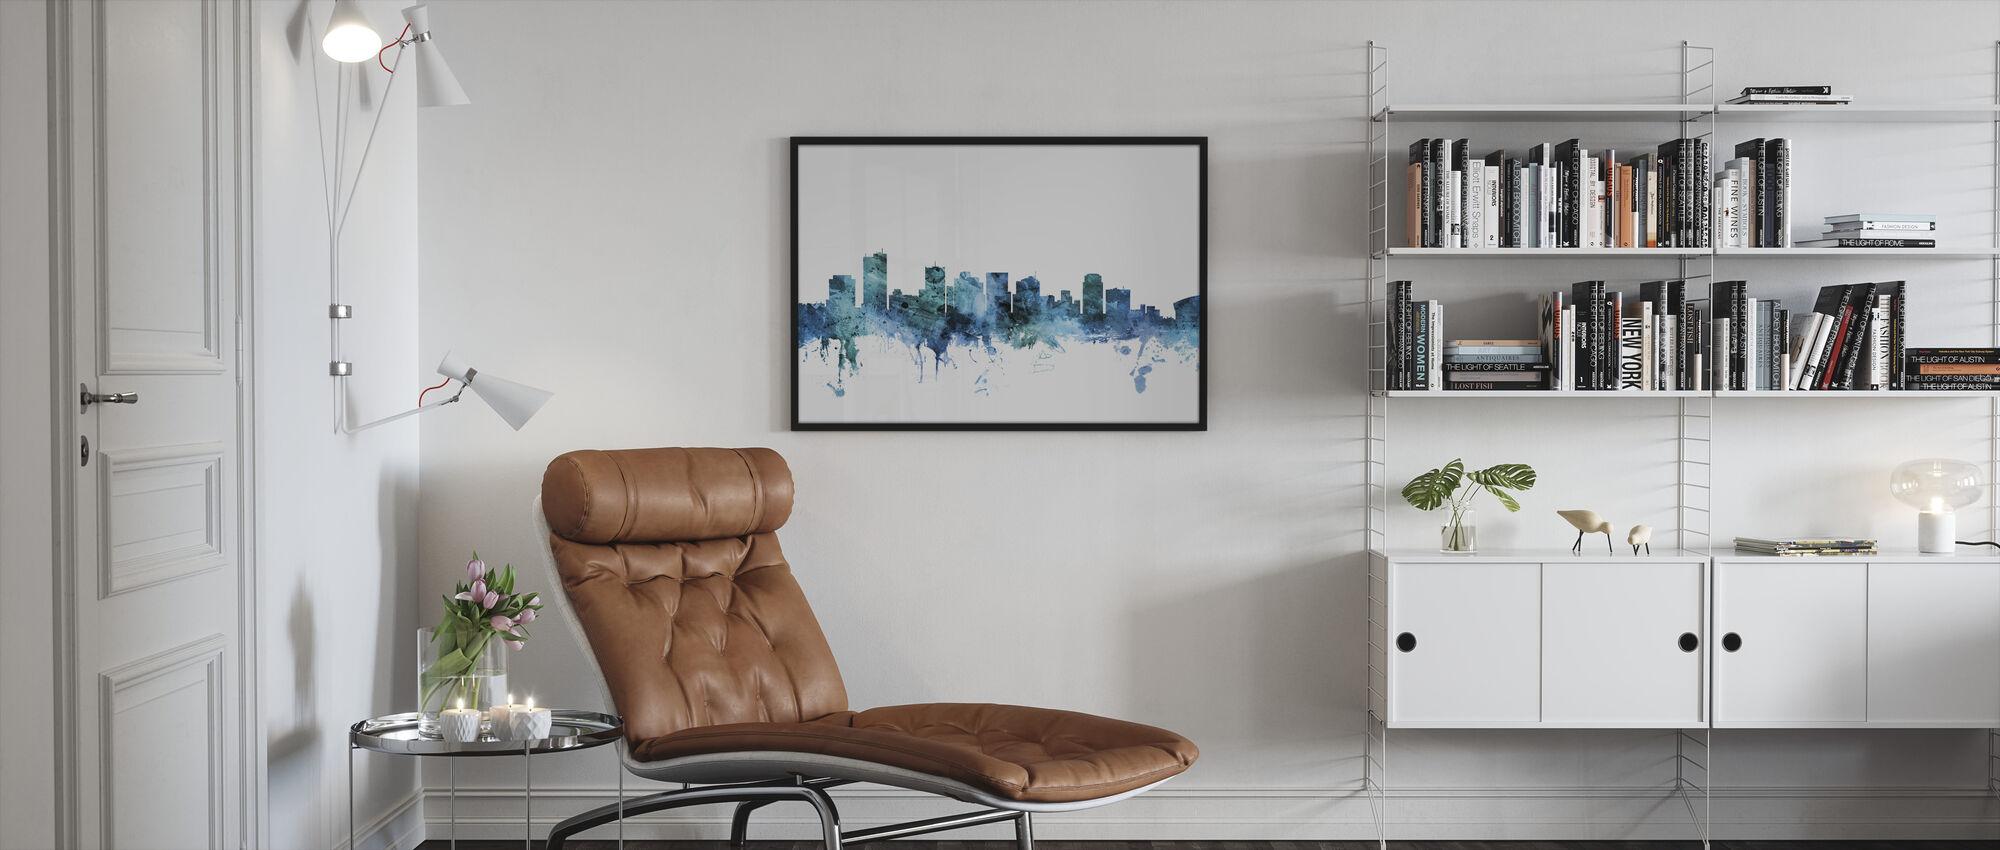 Phoenix Arizona Skyline - Framed print - Living Room